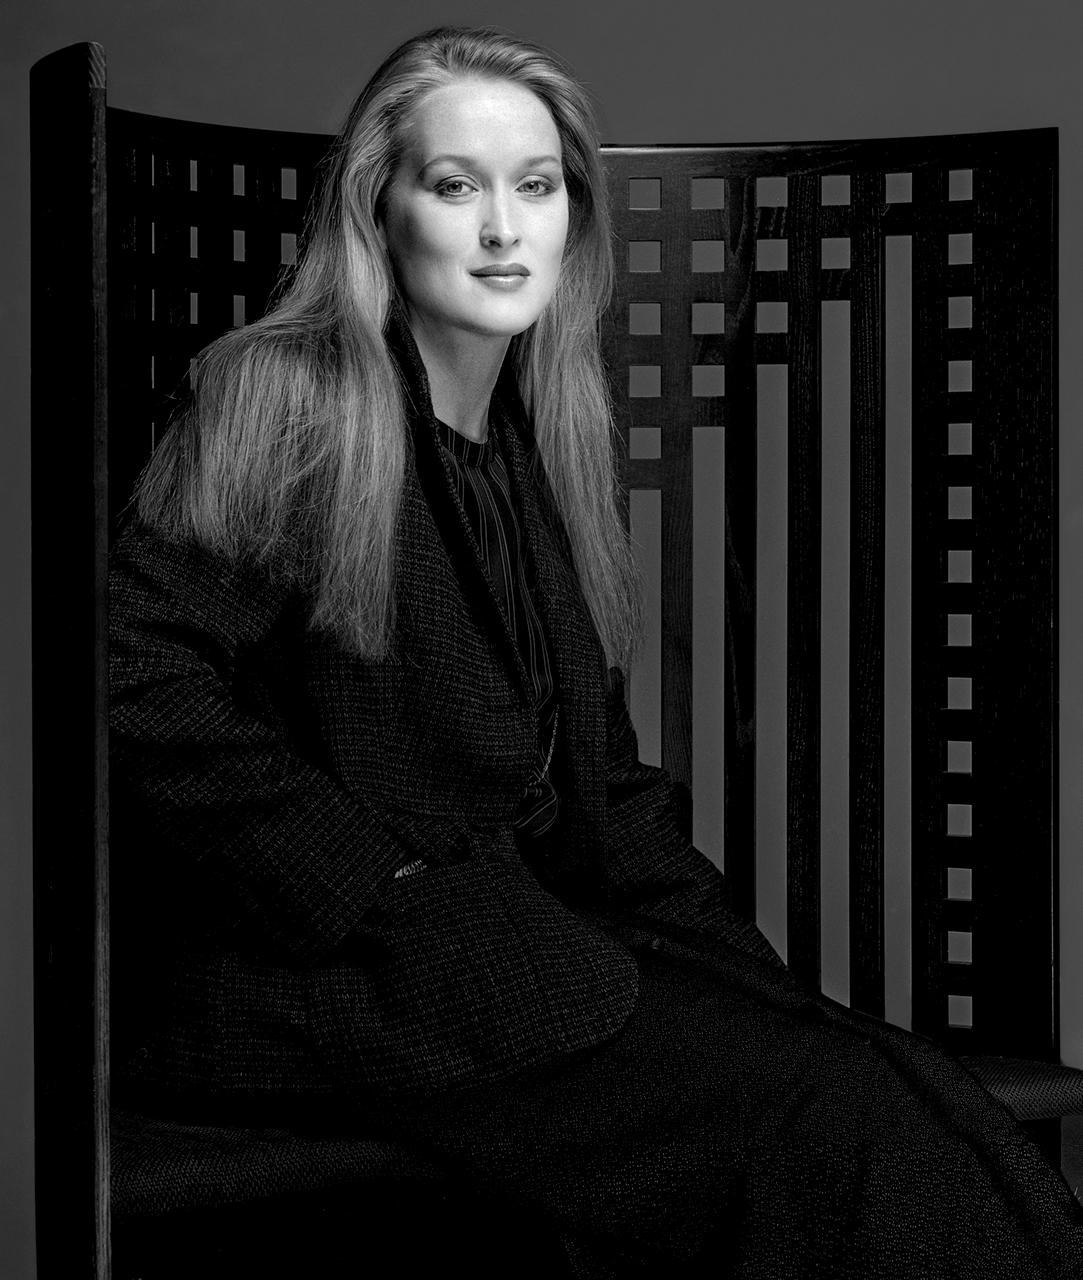 Merrel-Streep-iJan-2018.Arrowsmit©